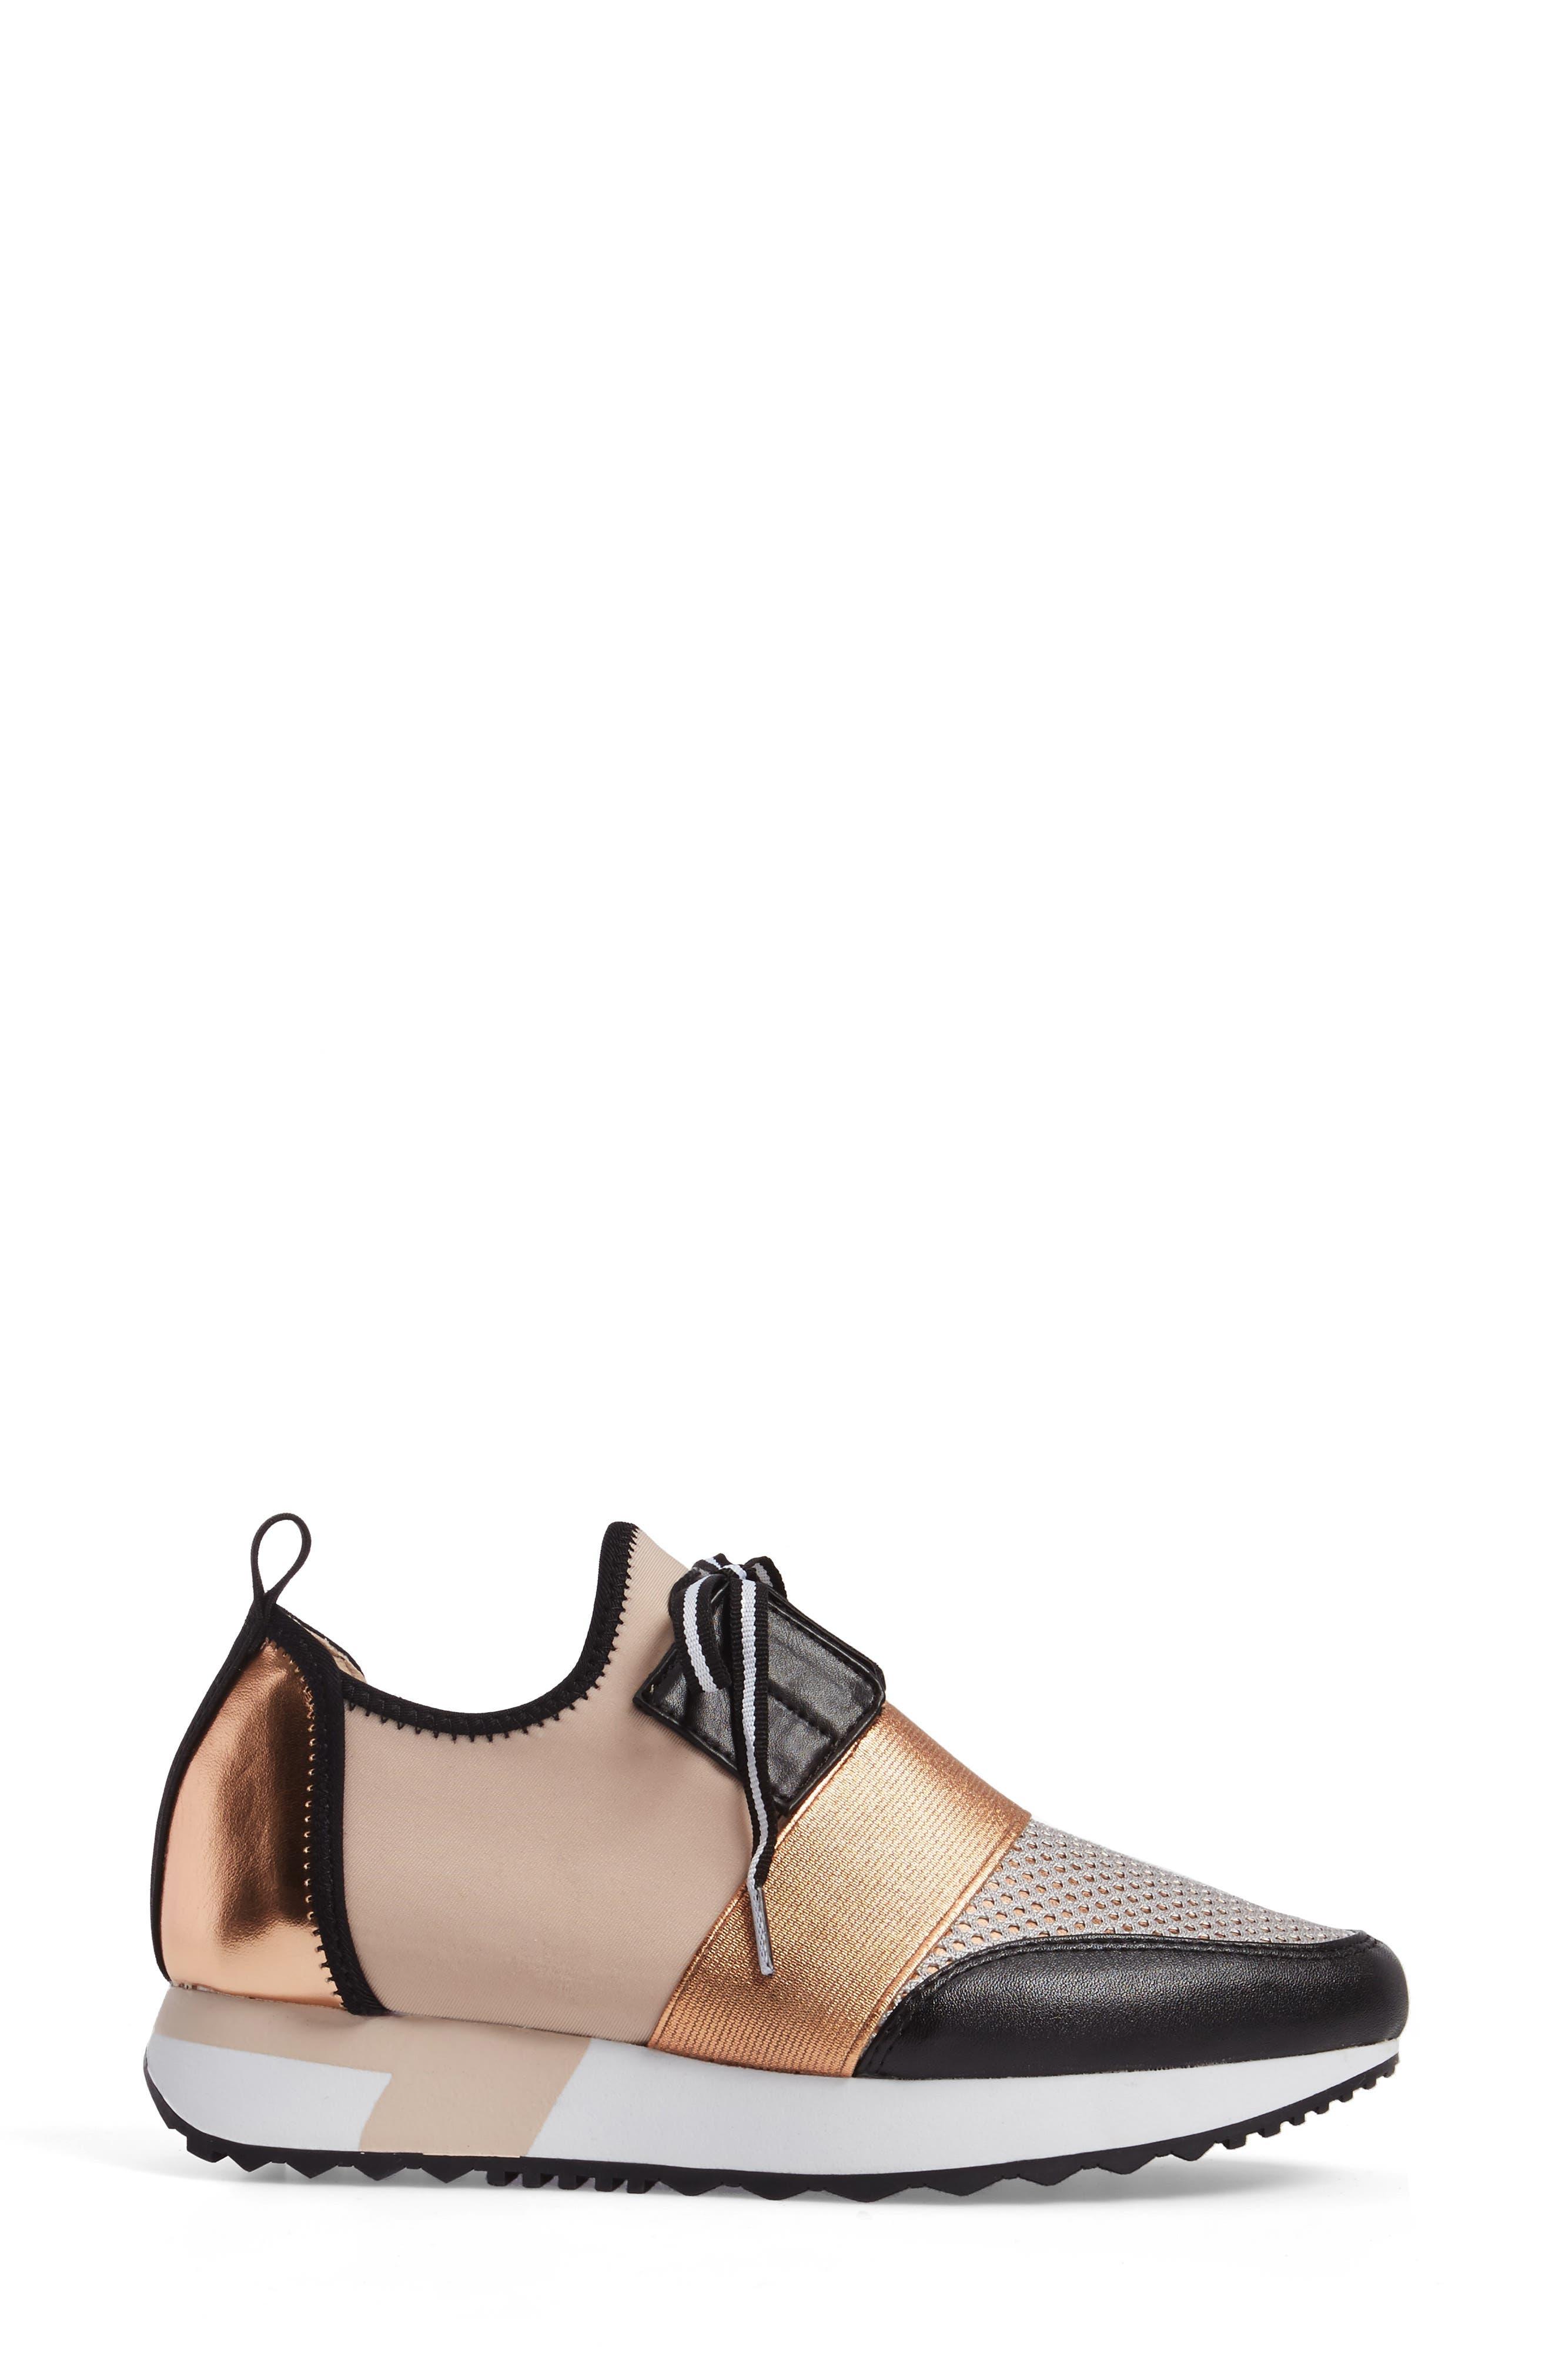 Antics Sneaker,                             Alternate thumbnail 3, color,                             Rose Gold Faux Leather